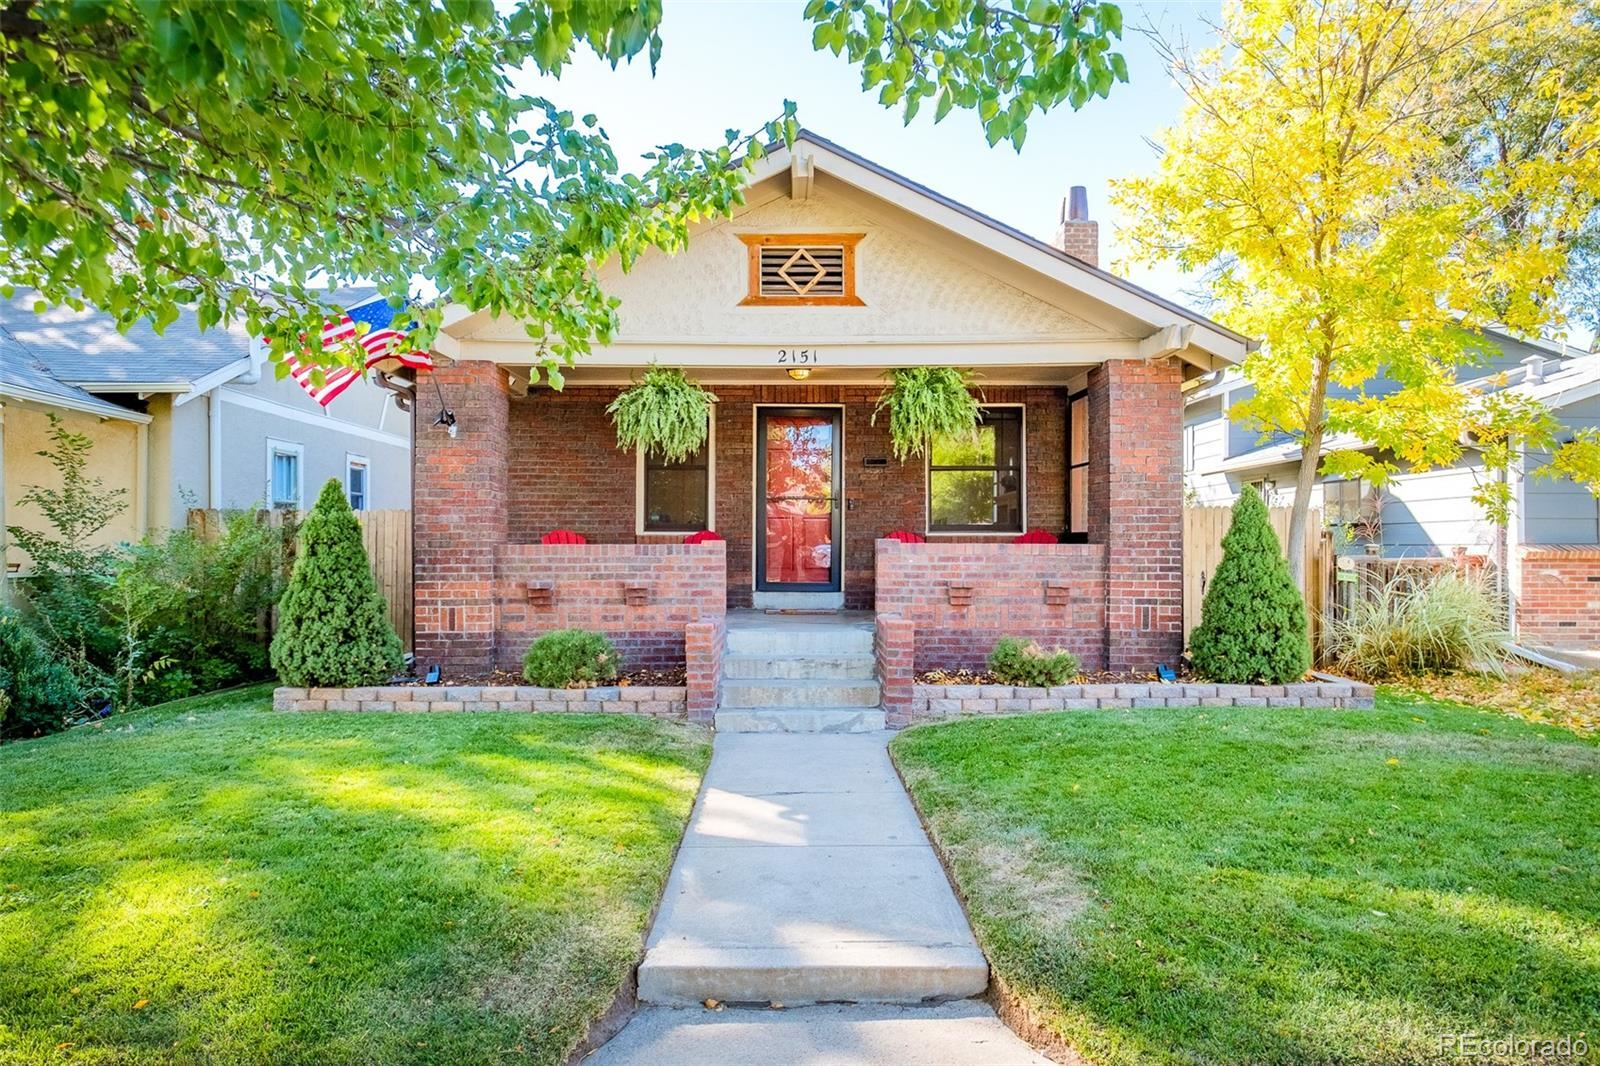 Photo of 2151 S Humboldt Street, Denver, CO 80210 (MLS # 9181625)